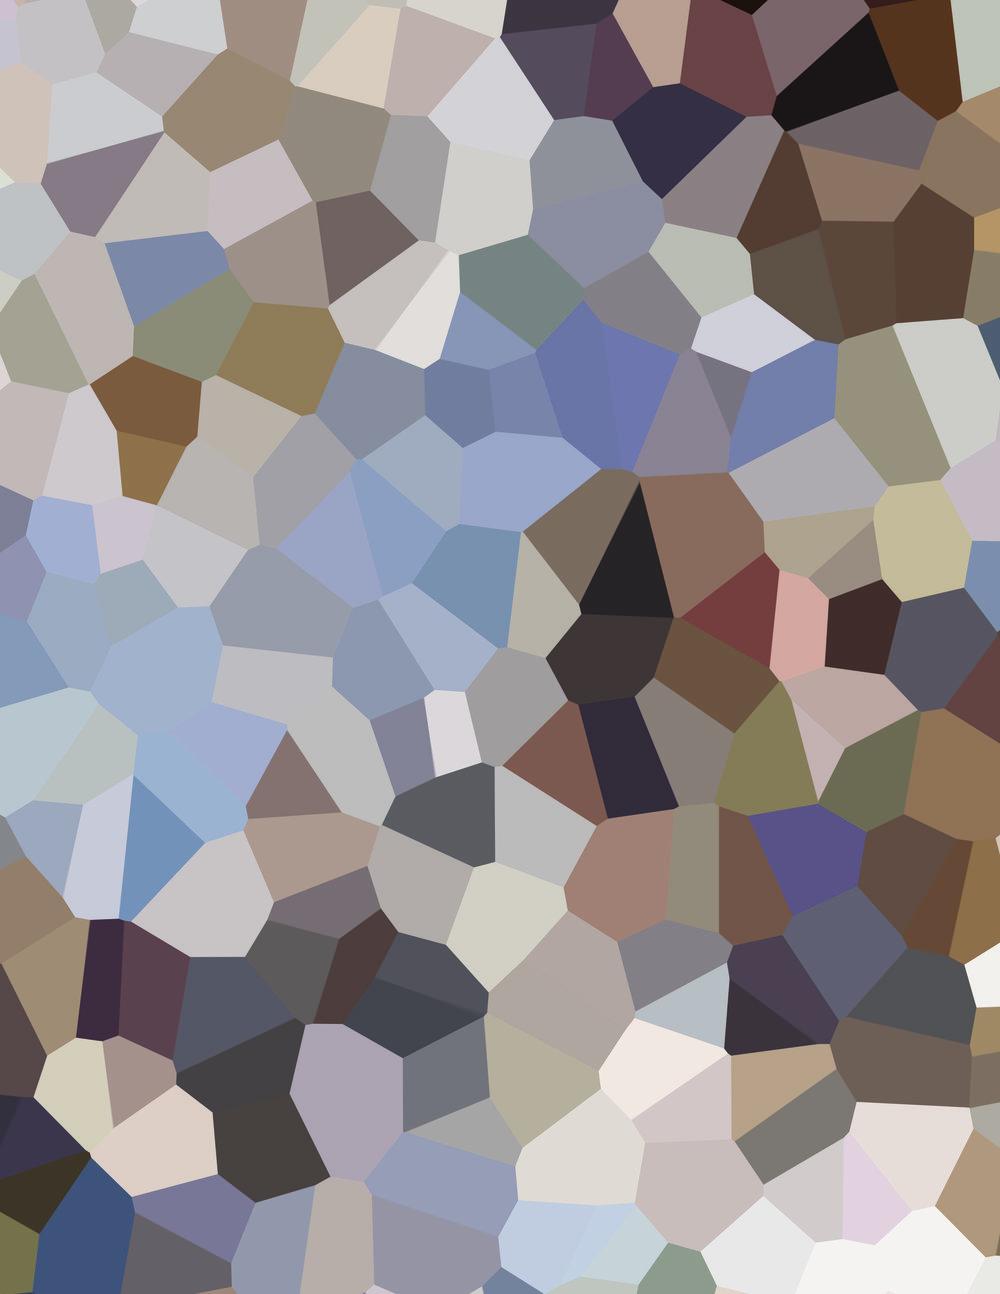 rock_4_mosaic.jpg